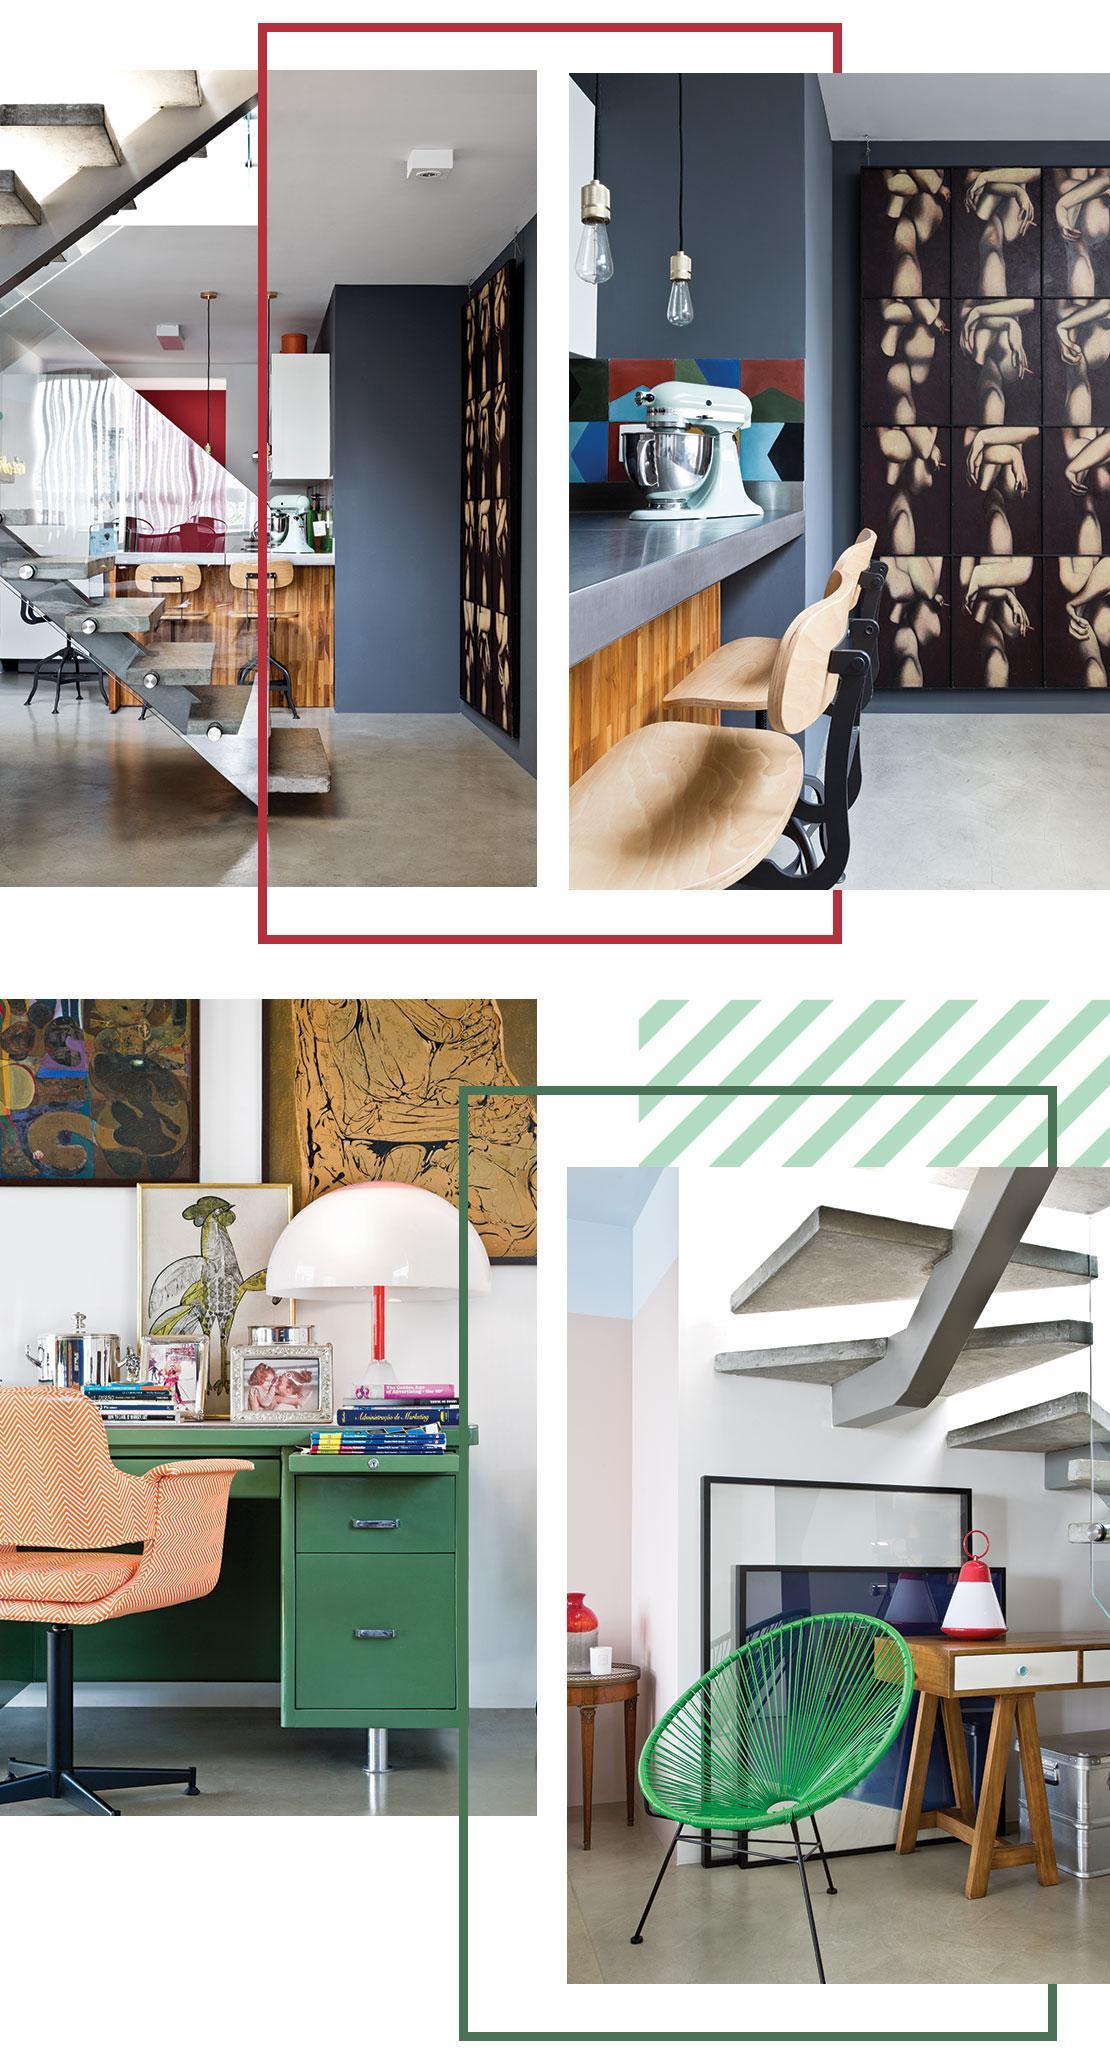 Ale-Tobler-Küche-Treppe-Westwing-Homestory